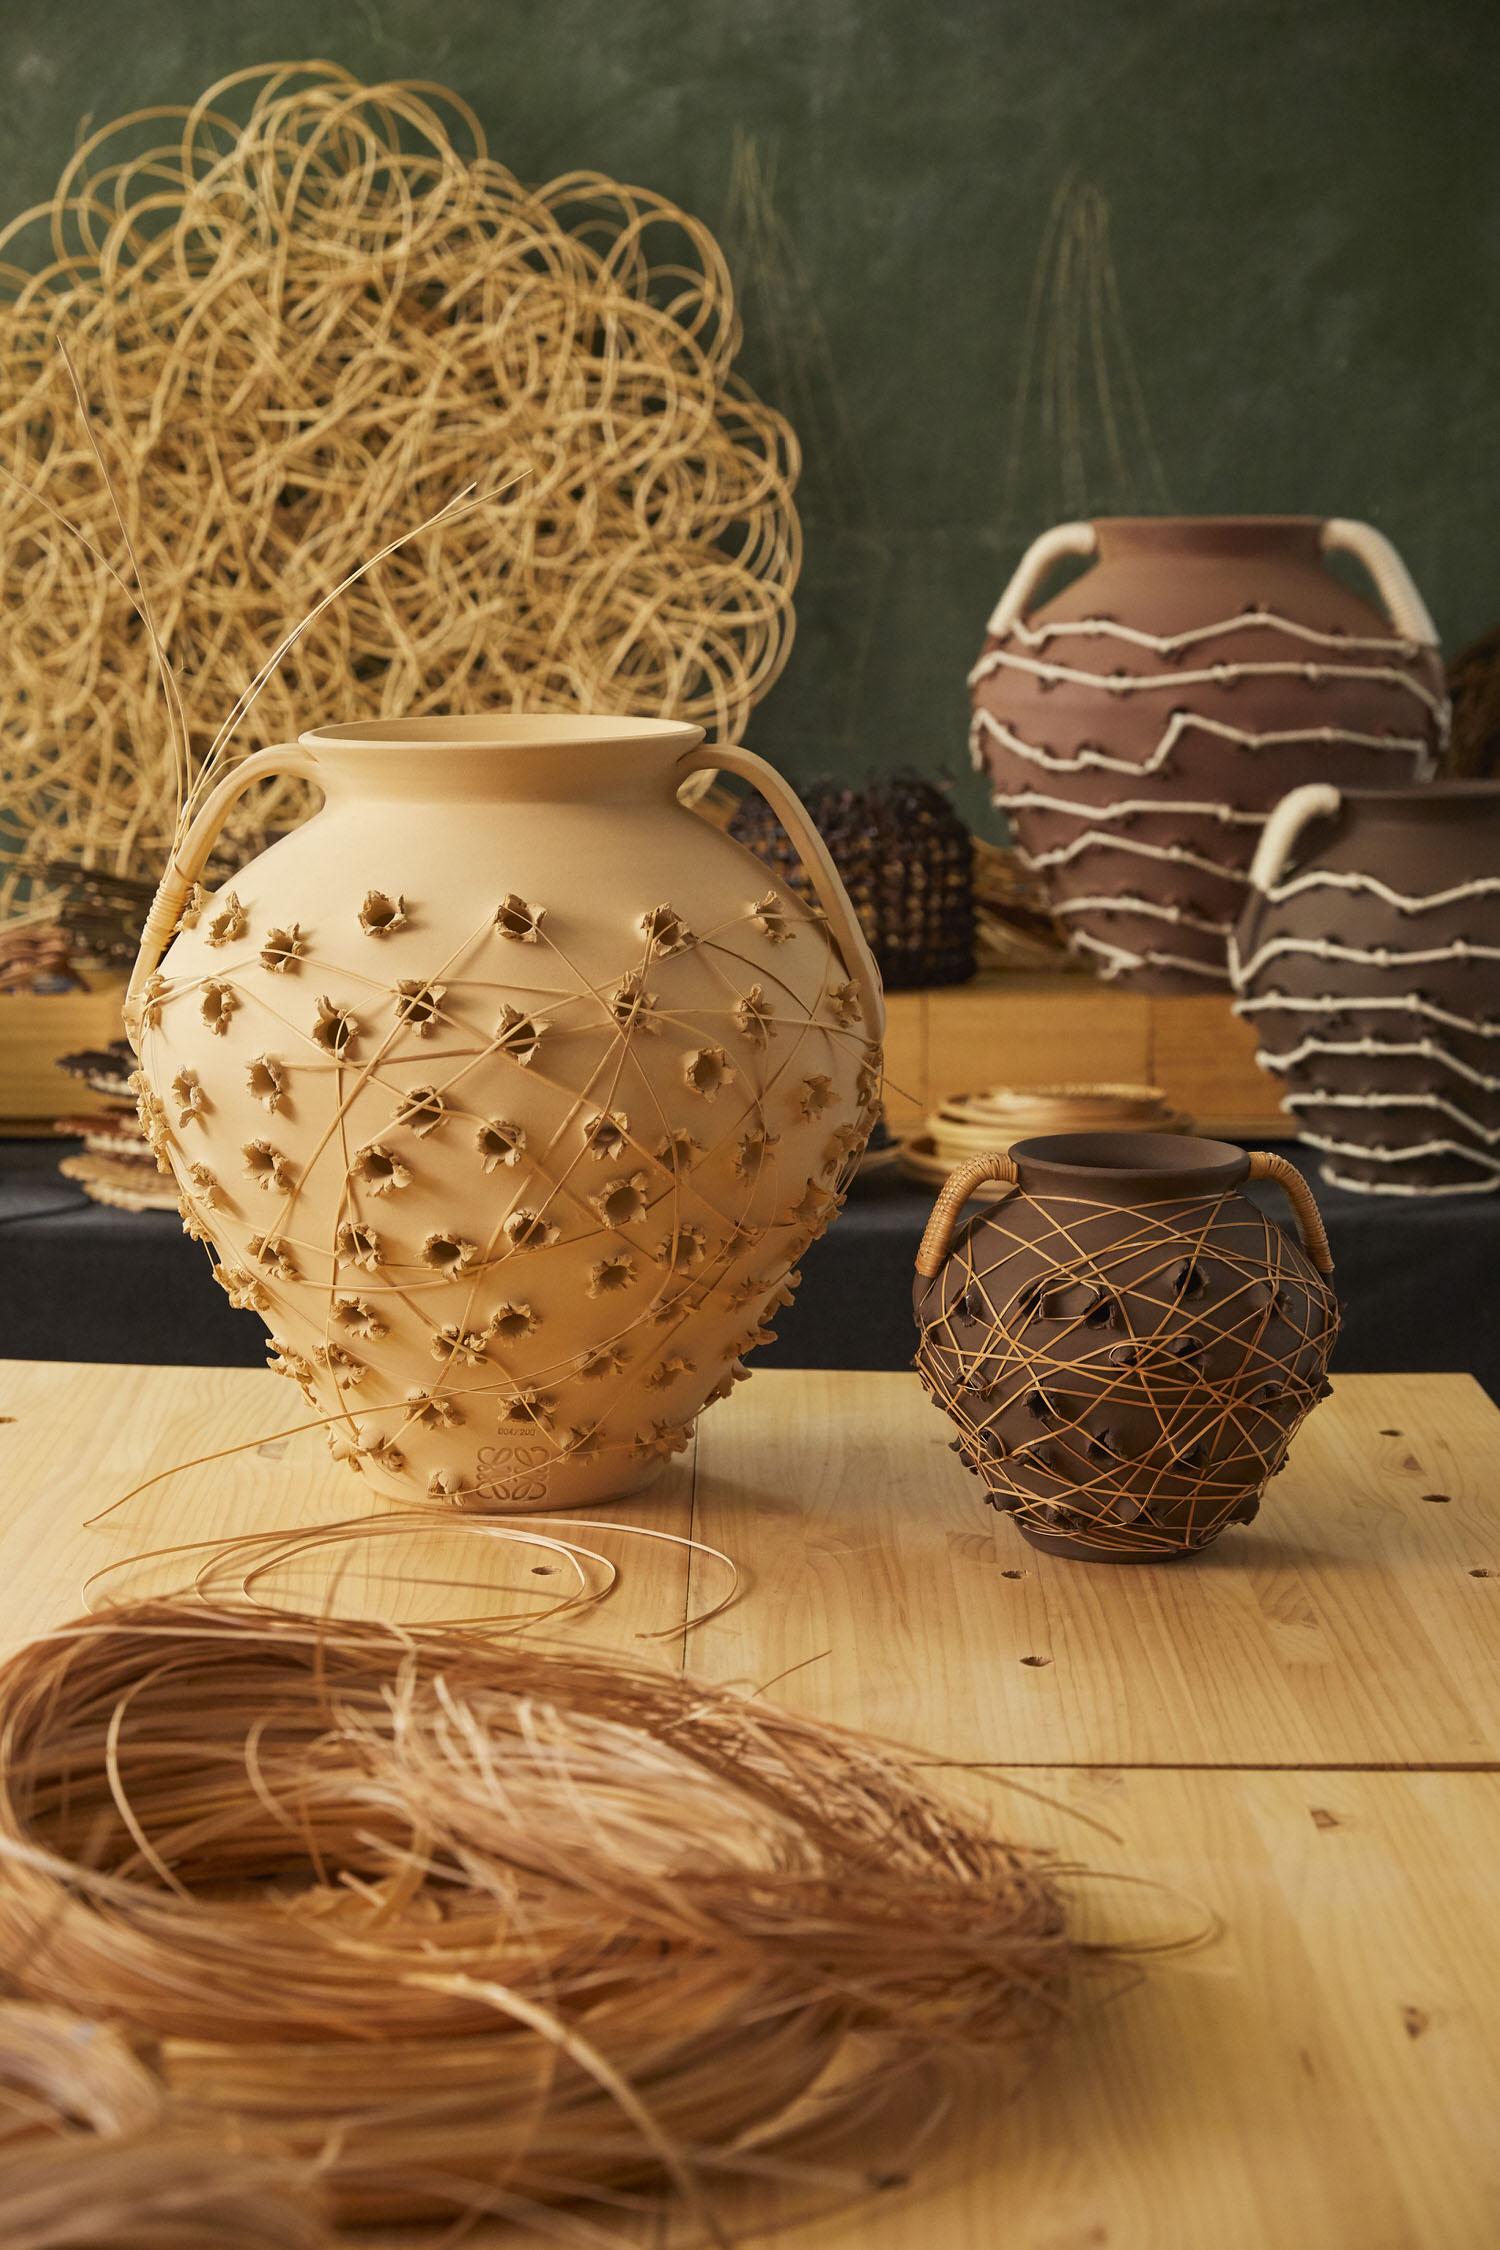 Loewe Waves Weaving Artist Idoia Cuesta Yellowtrace 11